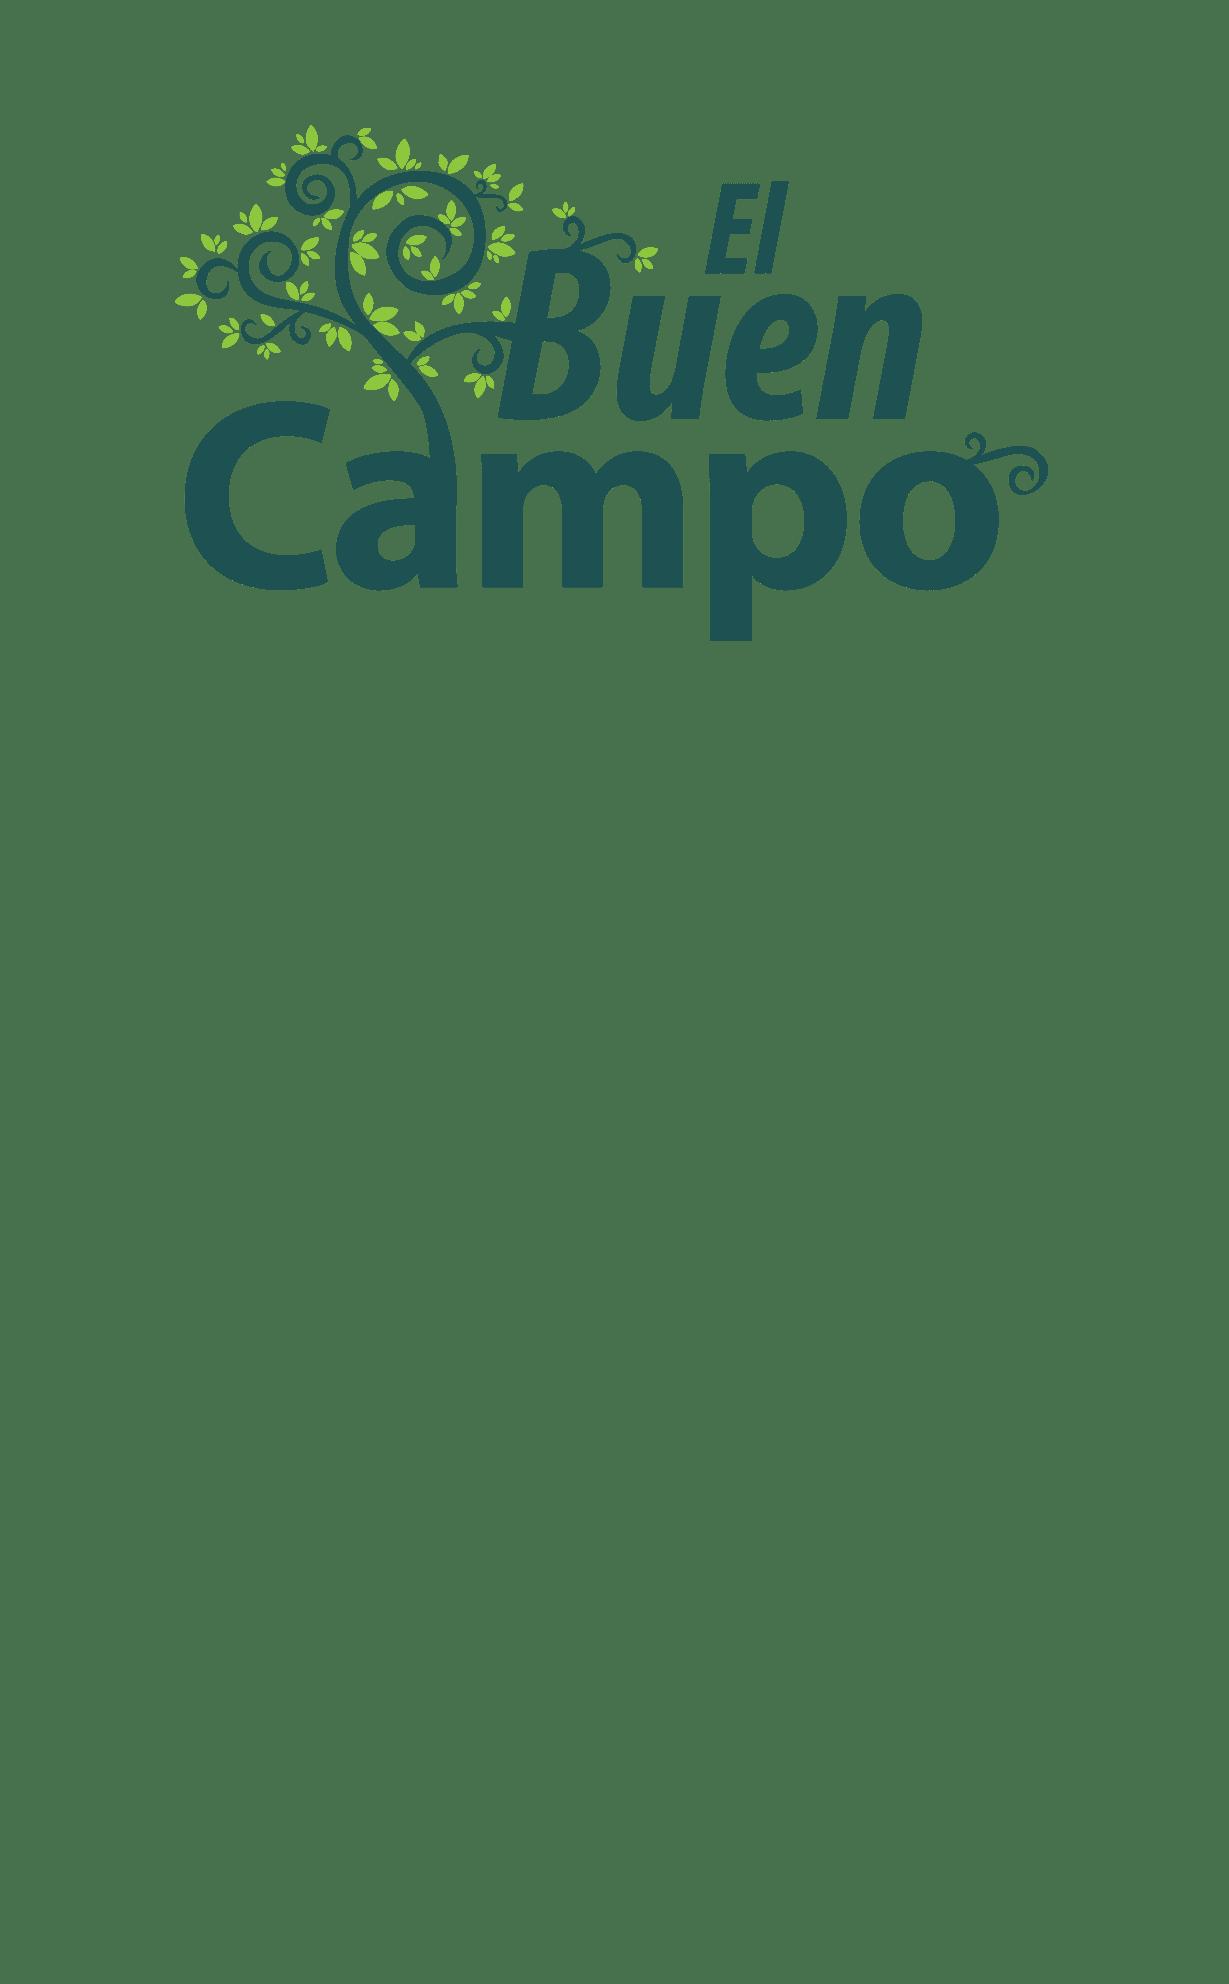 Grigio_ww_BC_logo